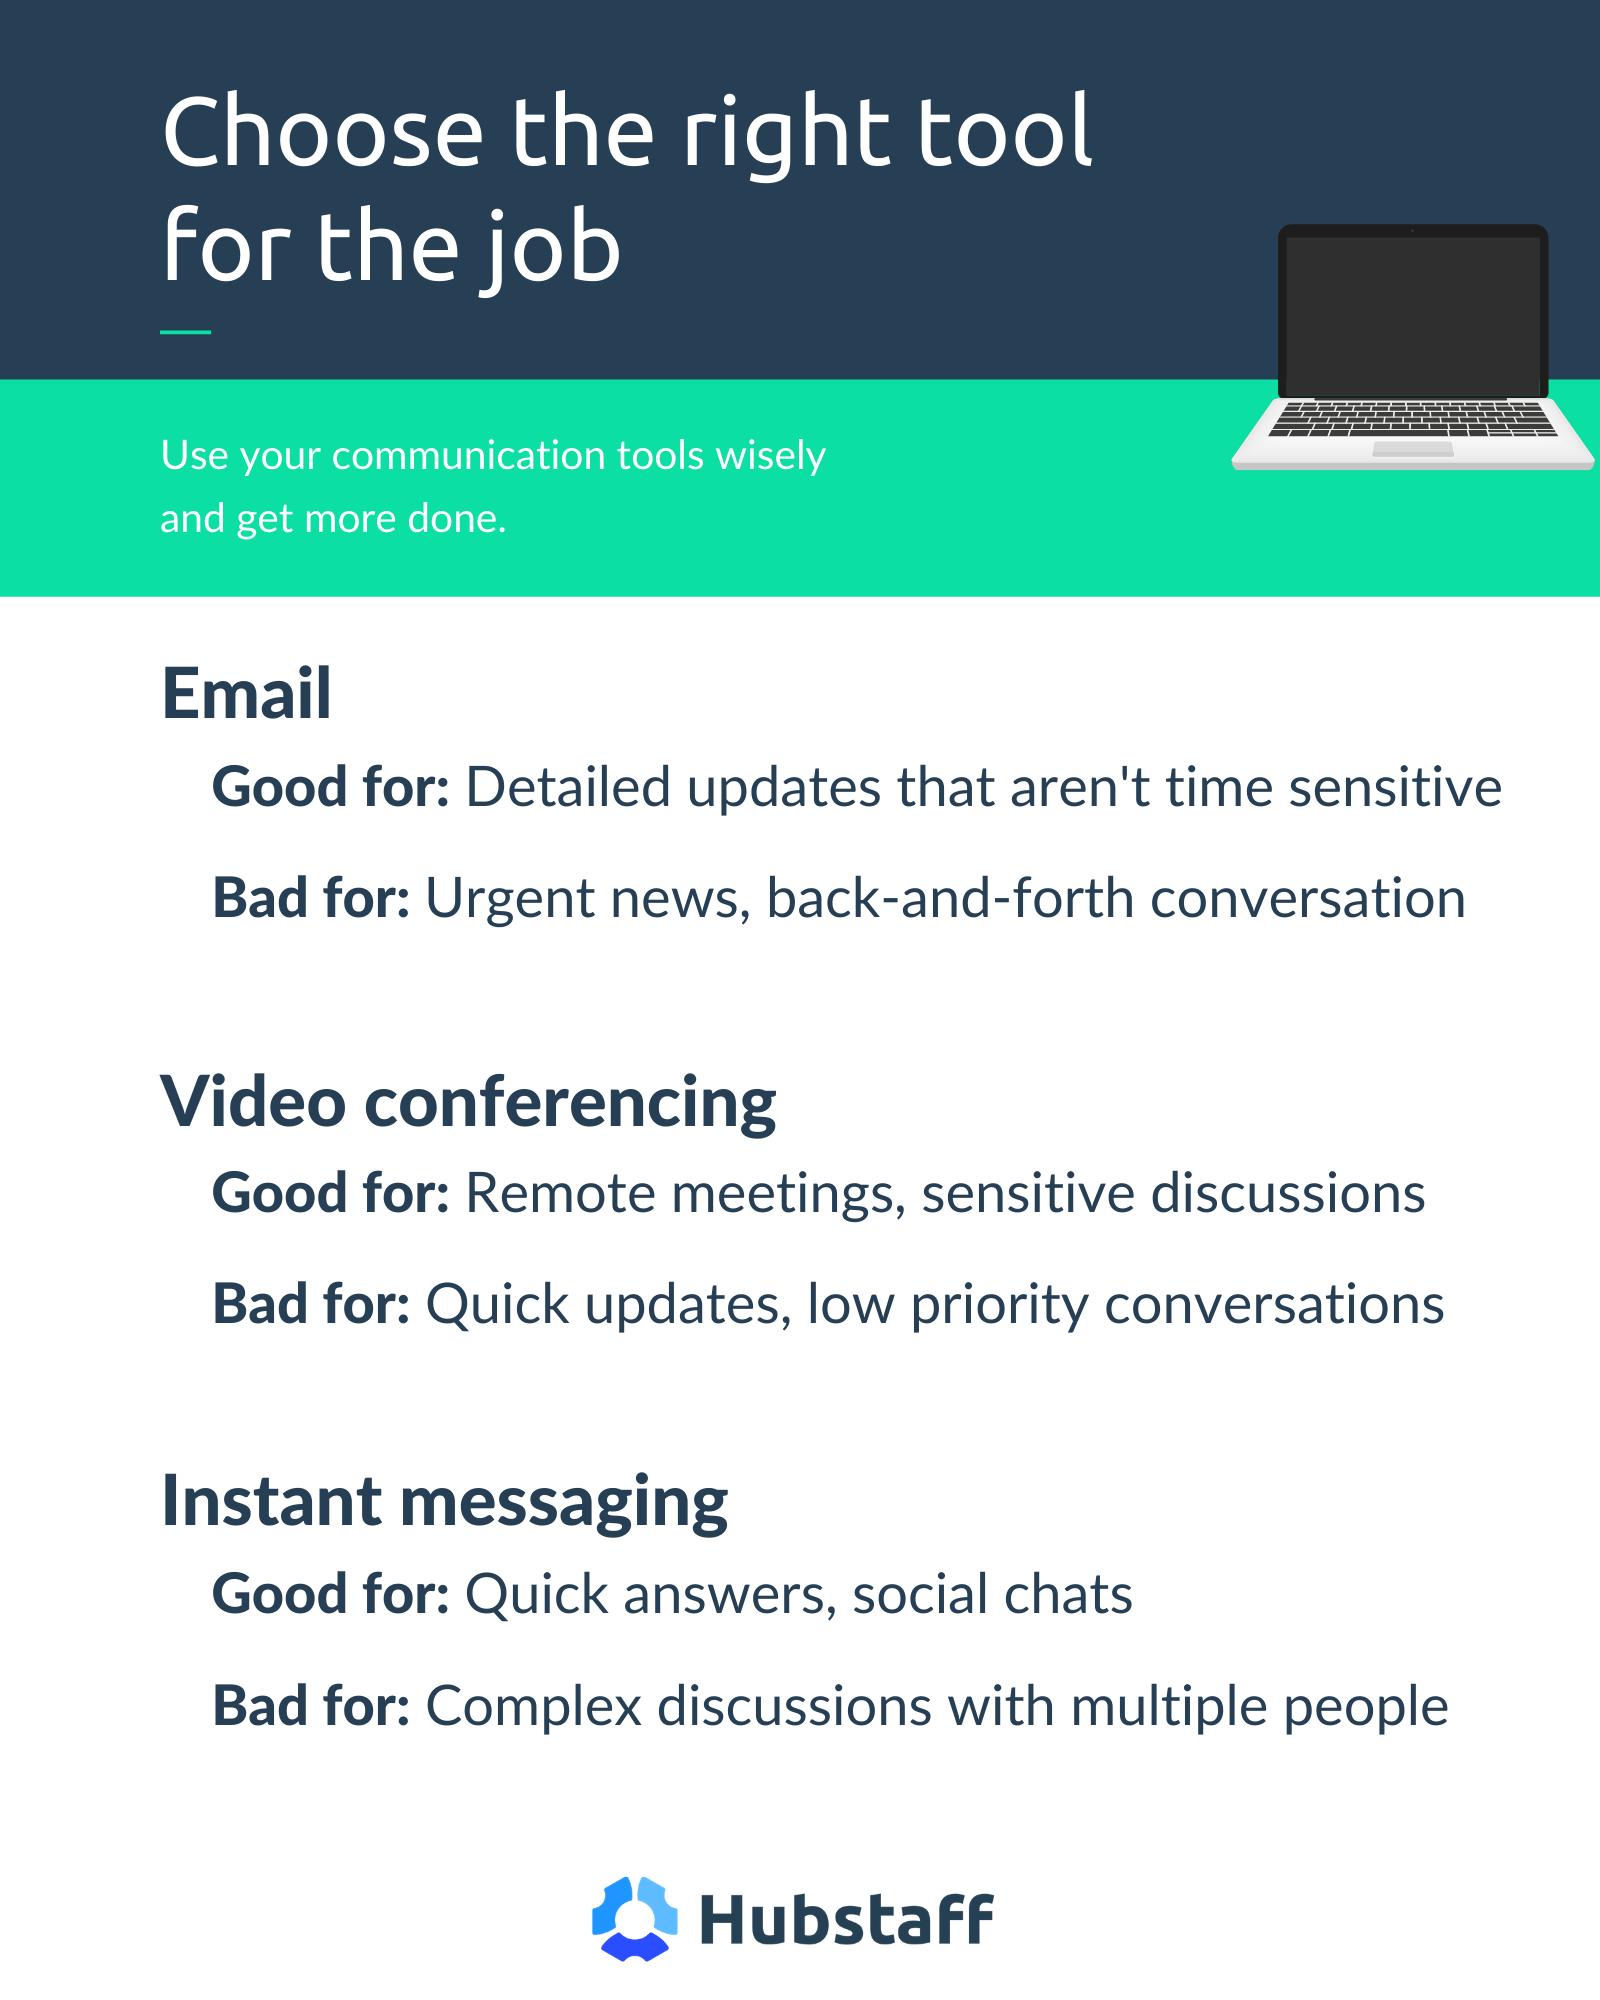 Choosing the right communication tool